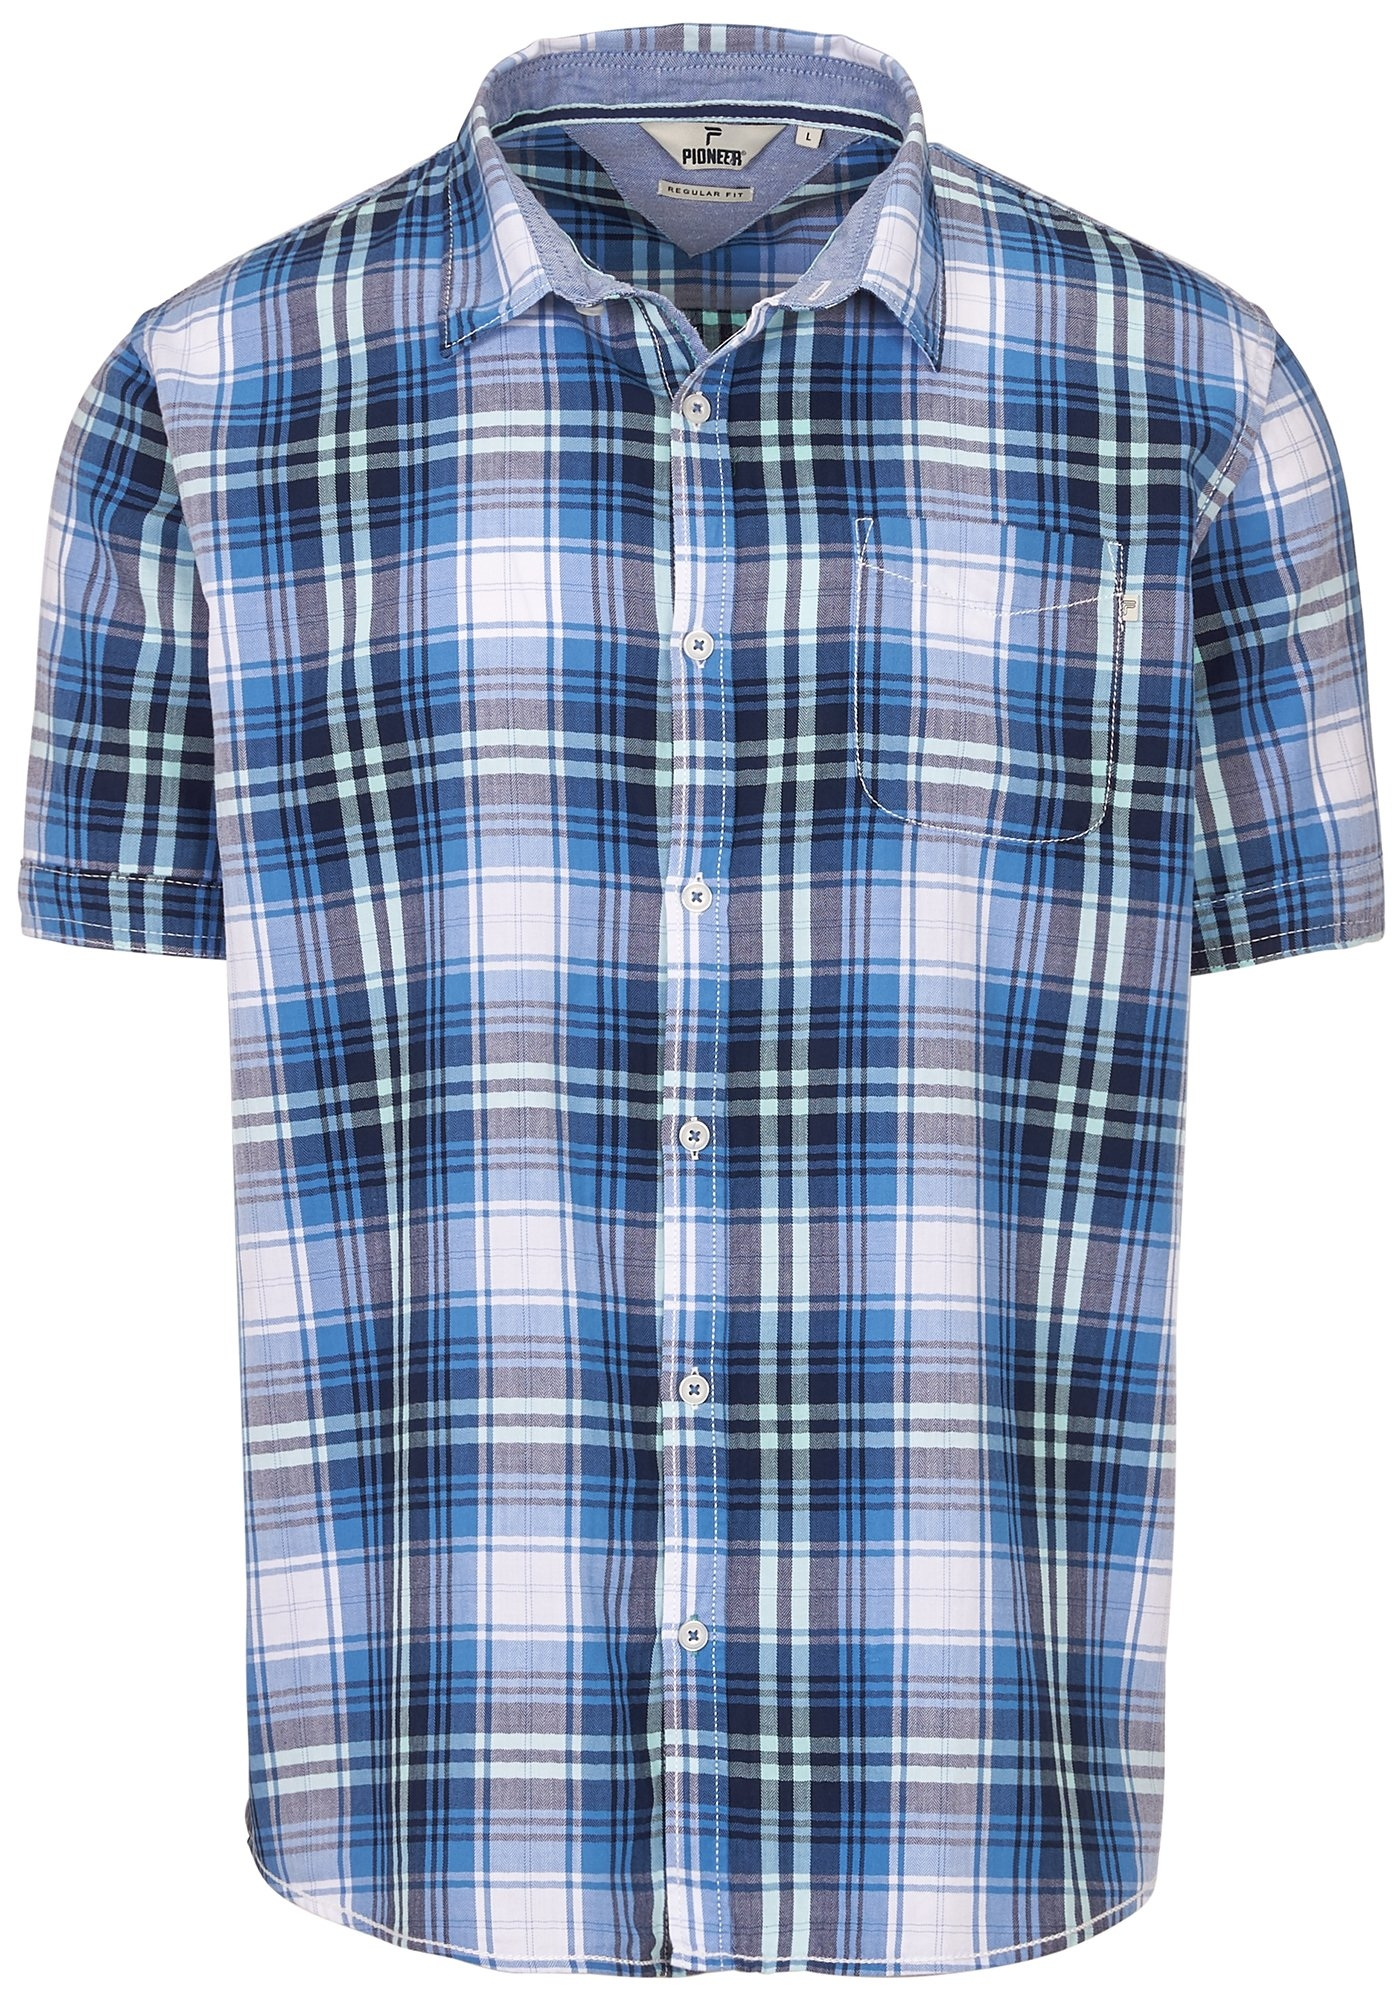 Heren Overhemd Blauw.Pioneer Herenoverhemd Herenoverhemd Shirt Online Bij Otto